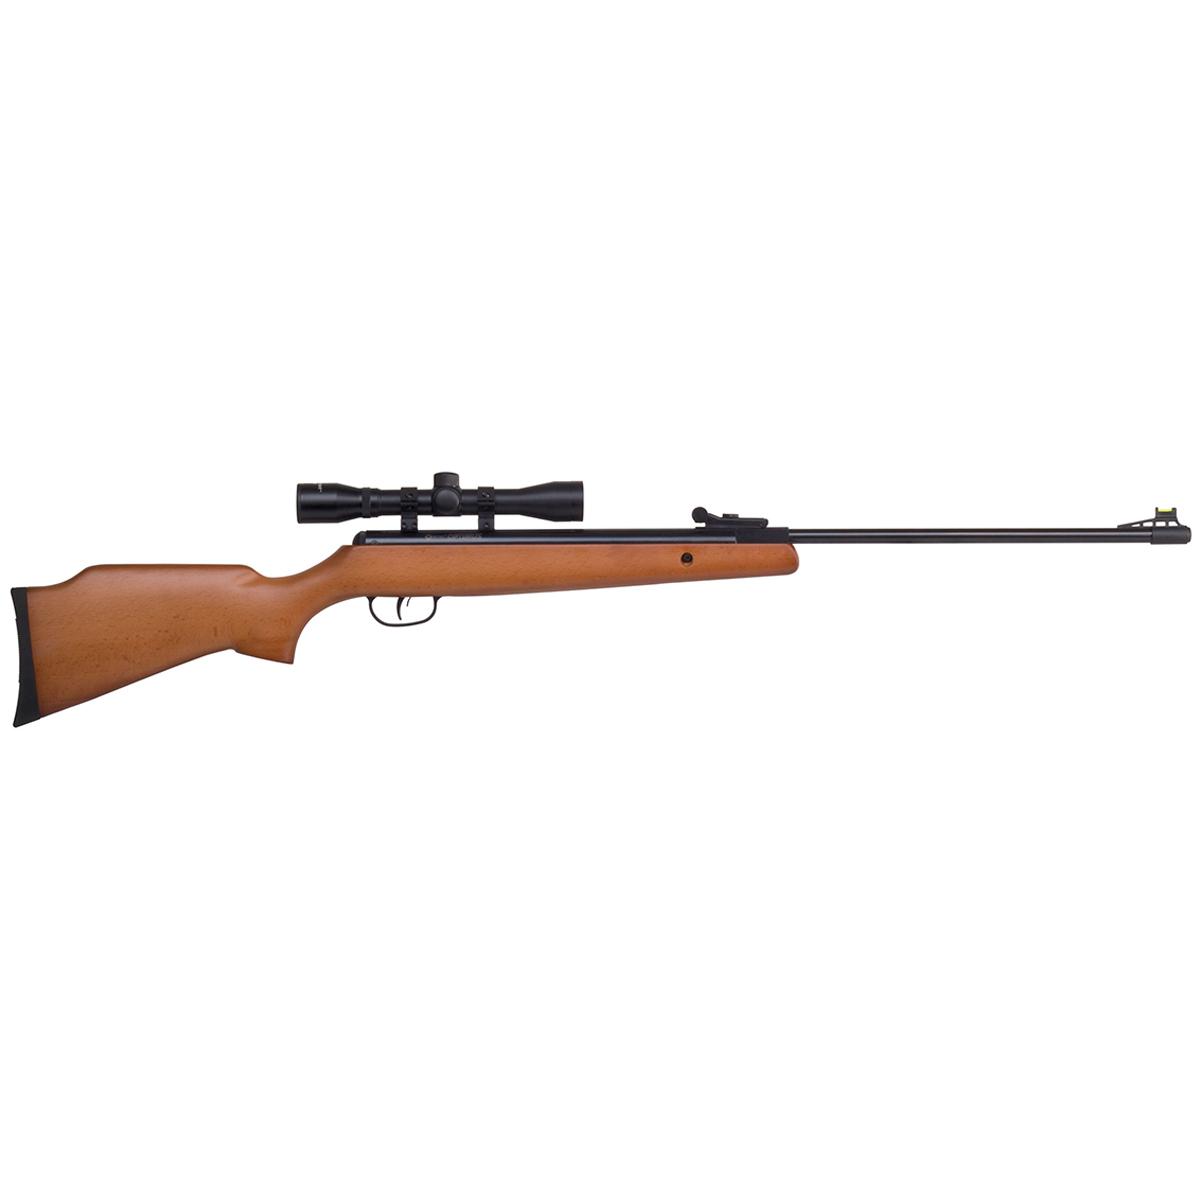 Rifle Resorte Optimus Cal5.5 Mira Telescópica 4x32mm Crosman